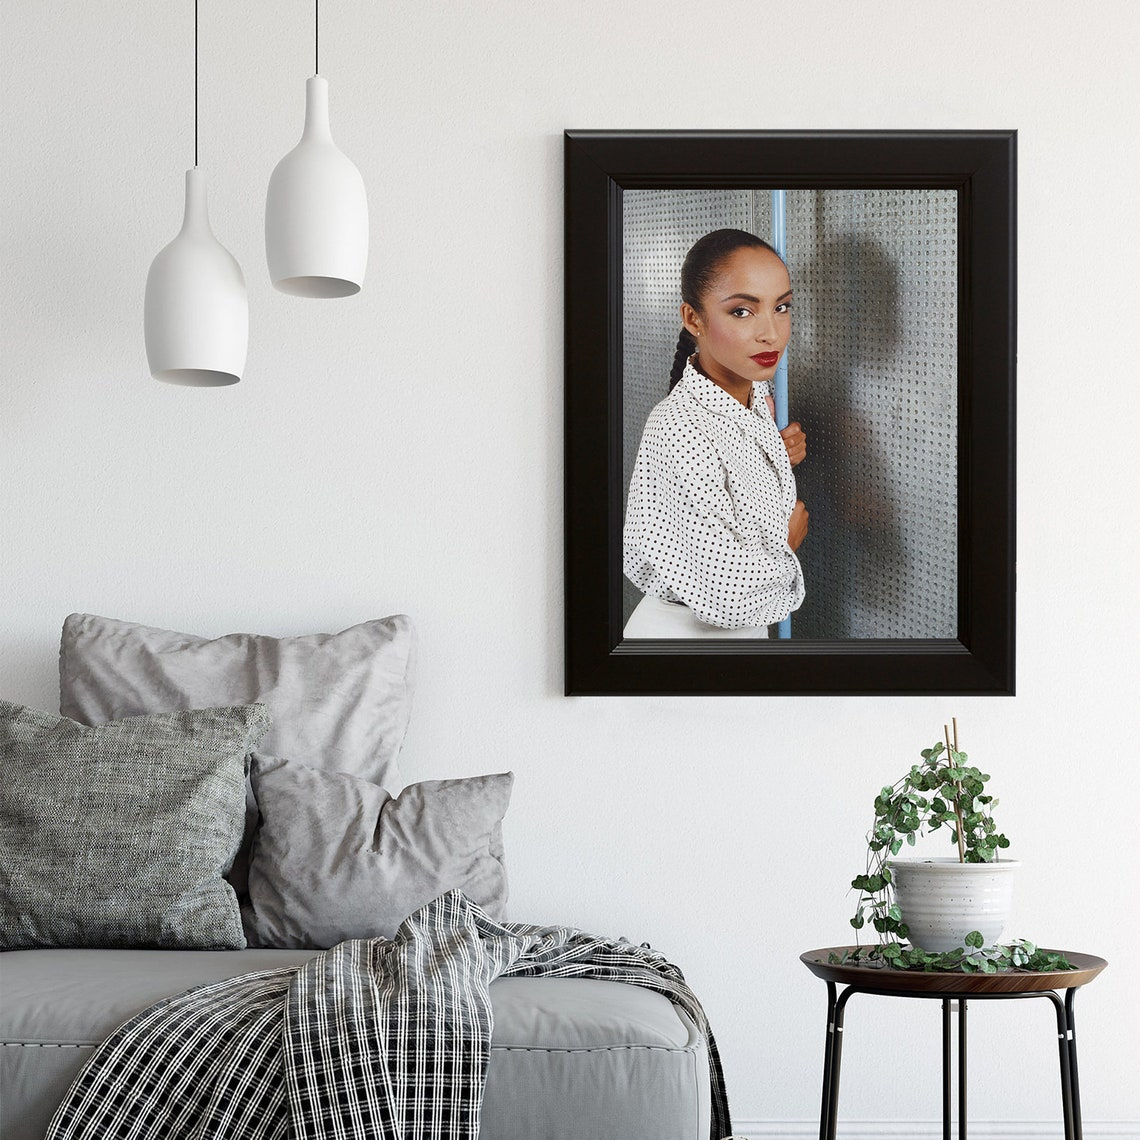 Cartel de retrato Sade Adu o impresión de arte / Sade Adu